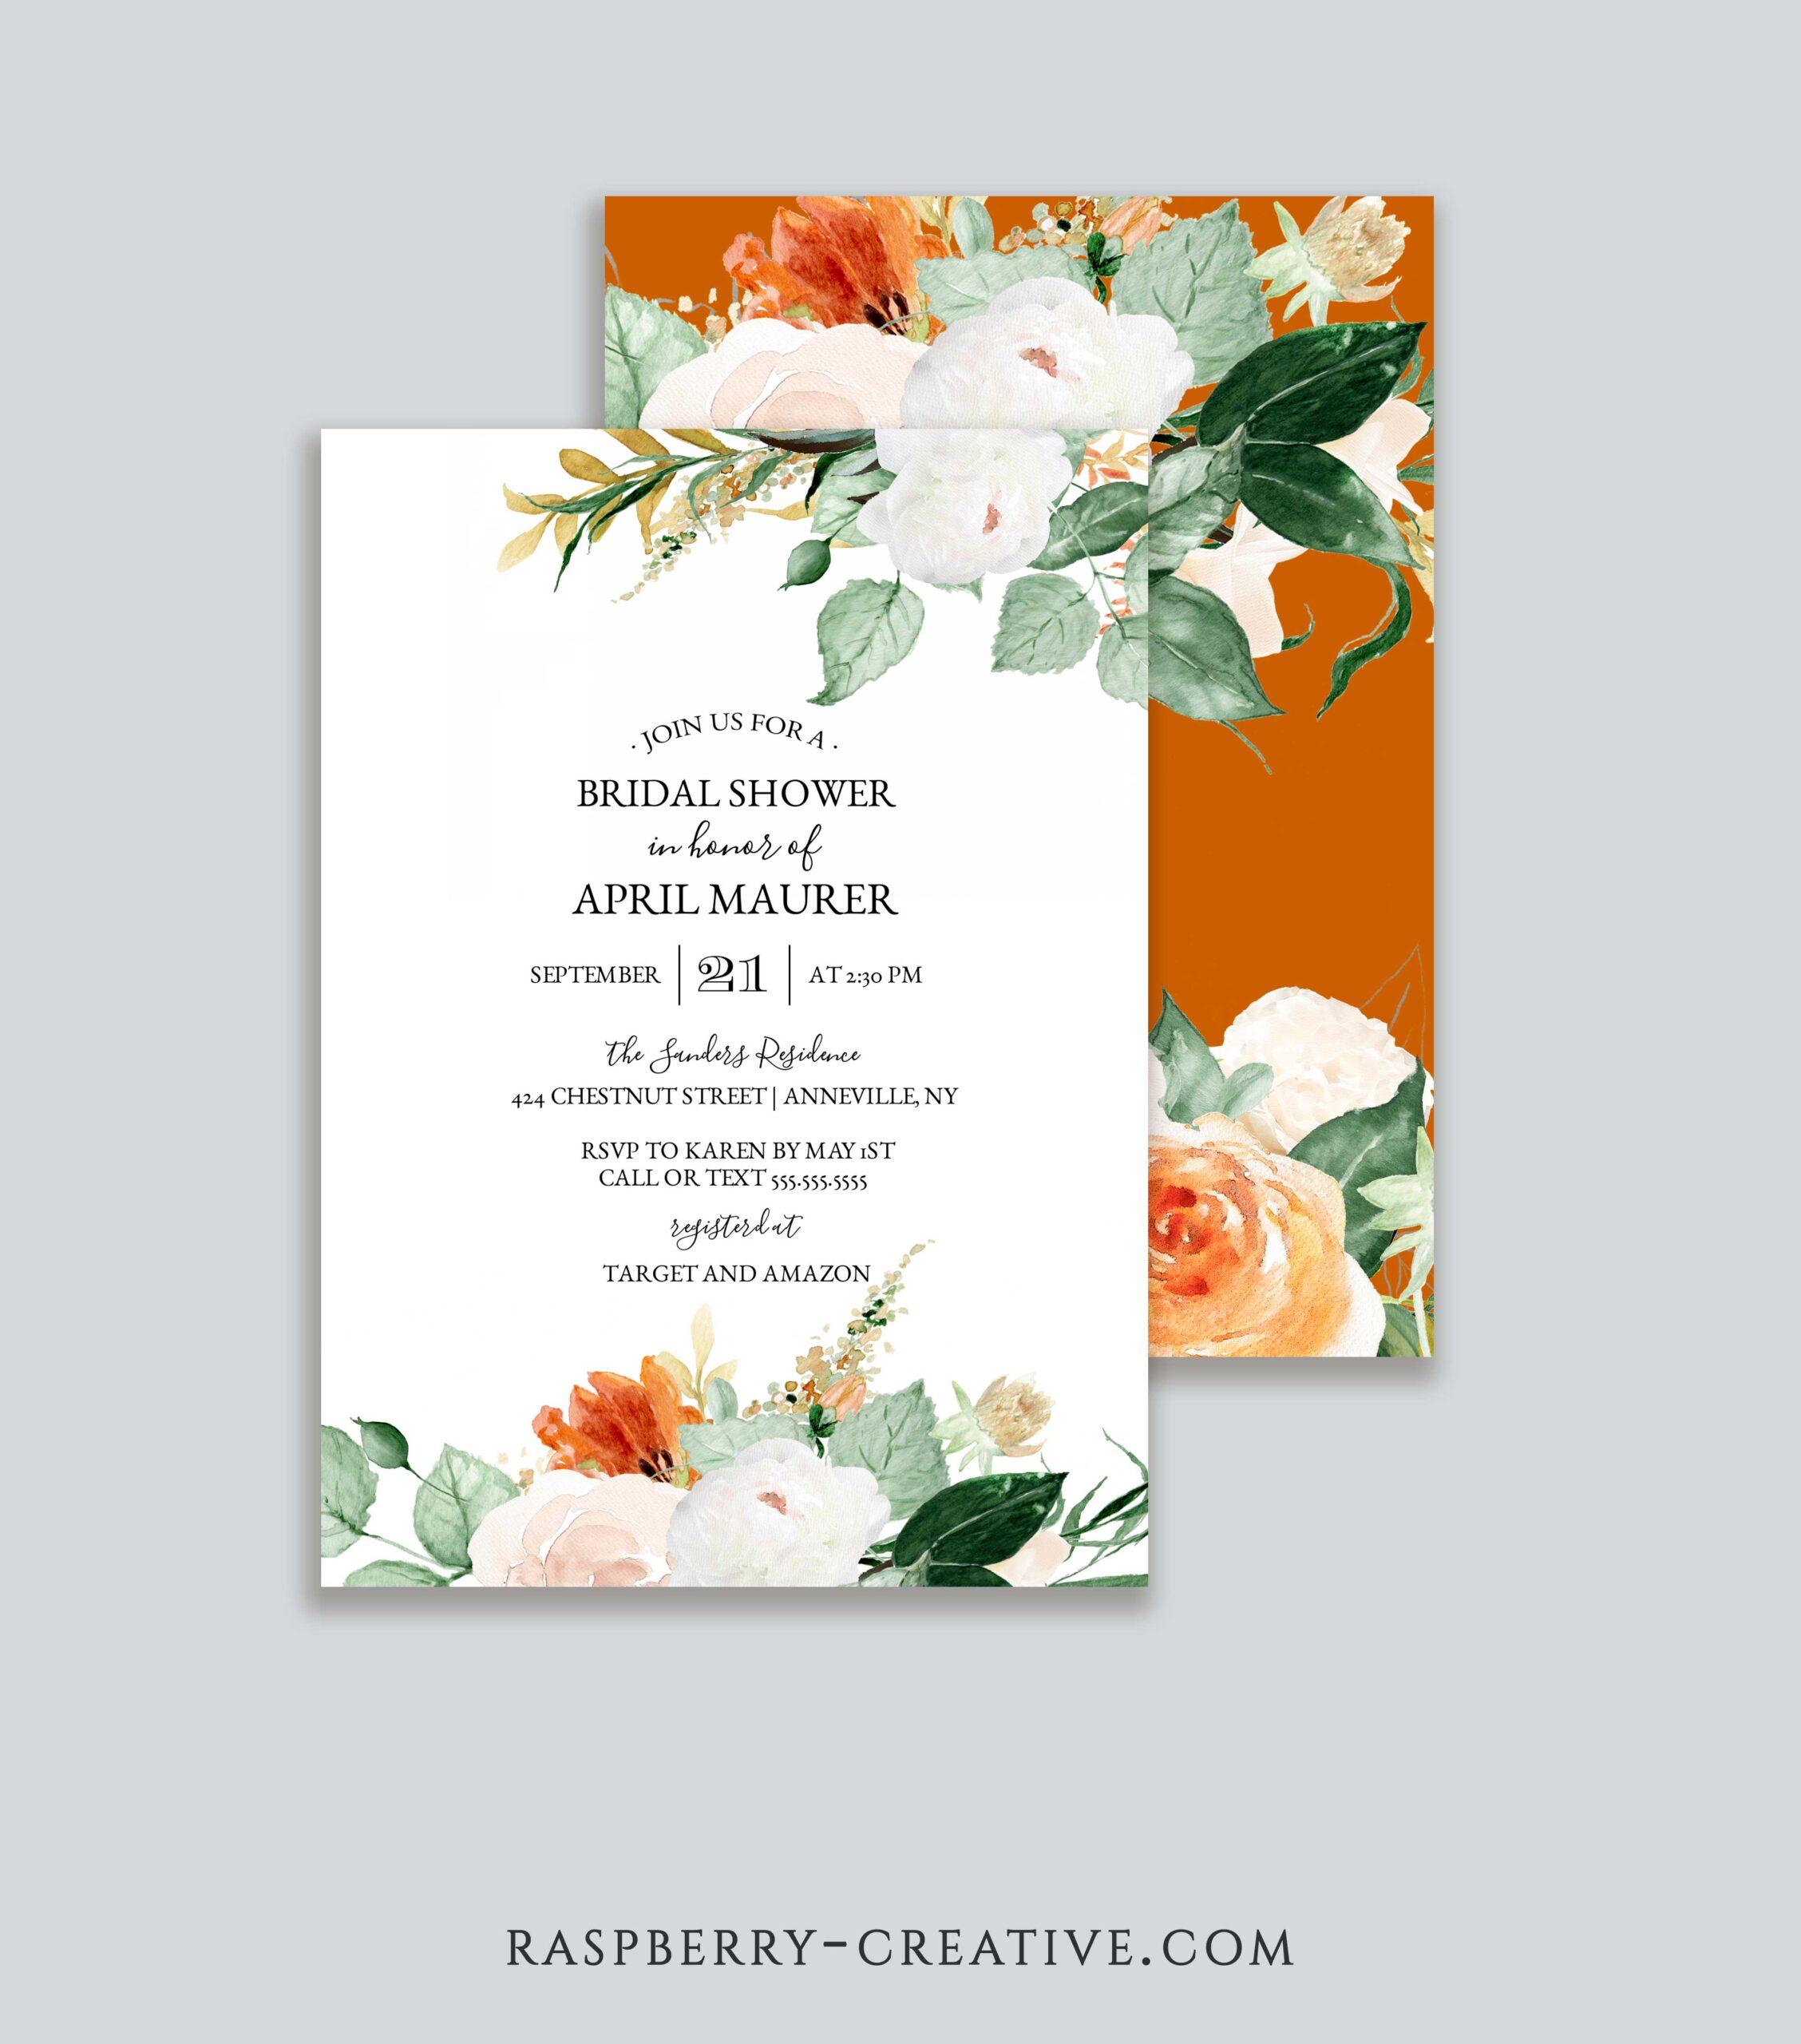 Early Fall Bridal Shower Invitation